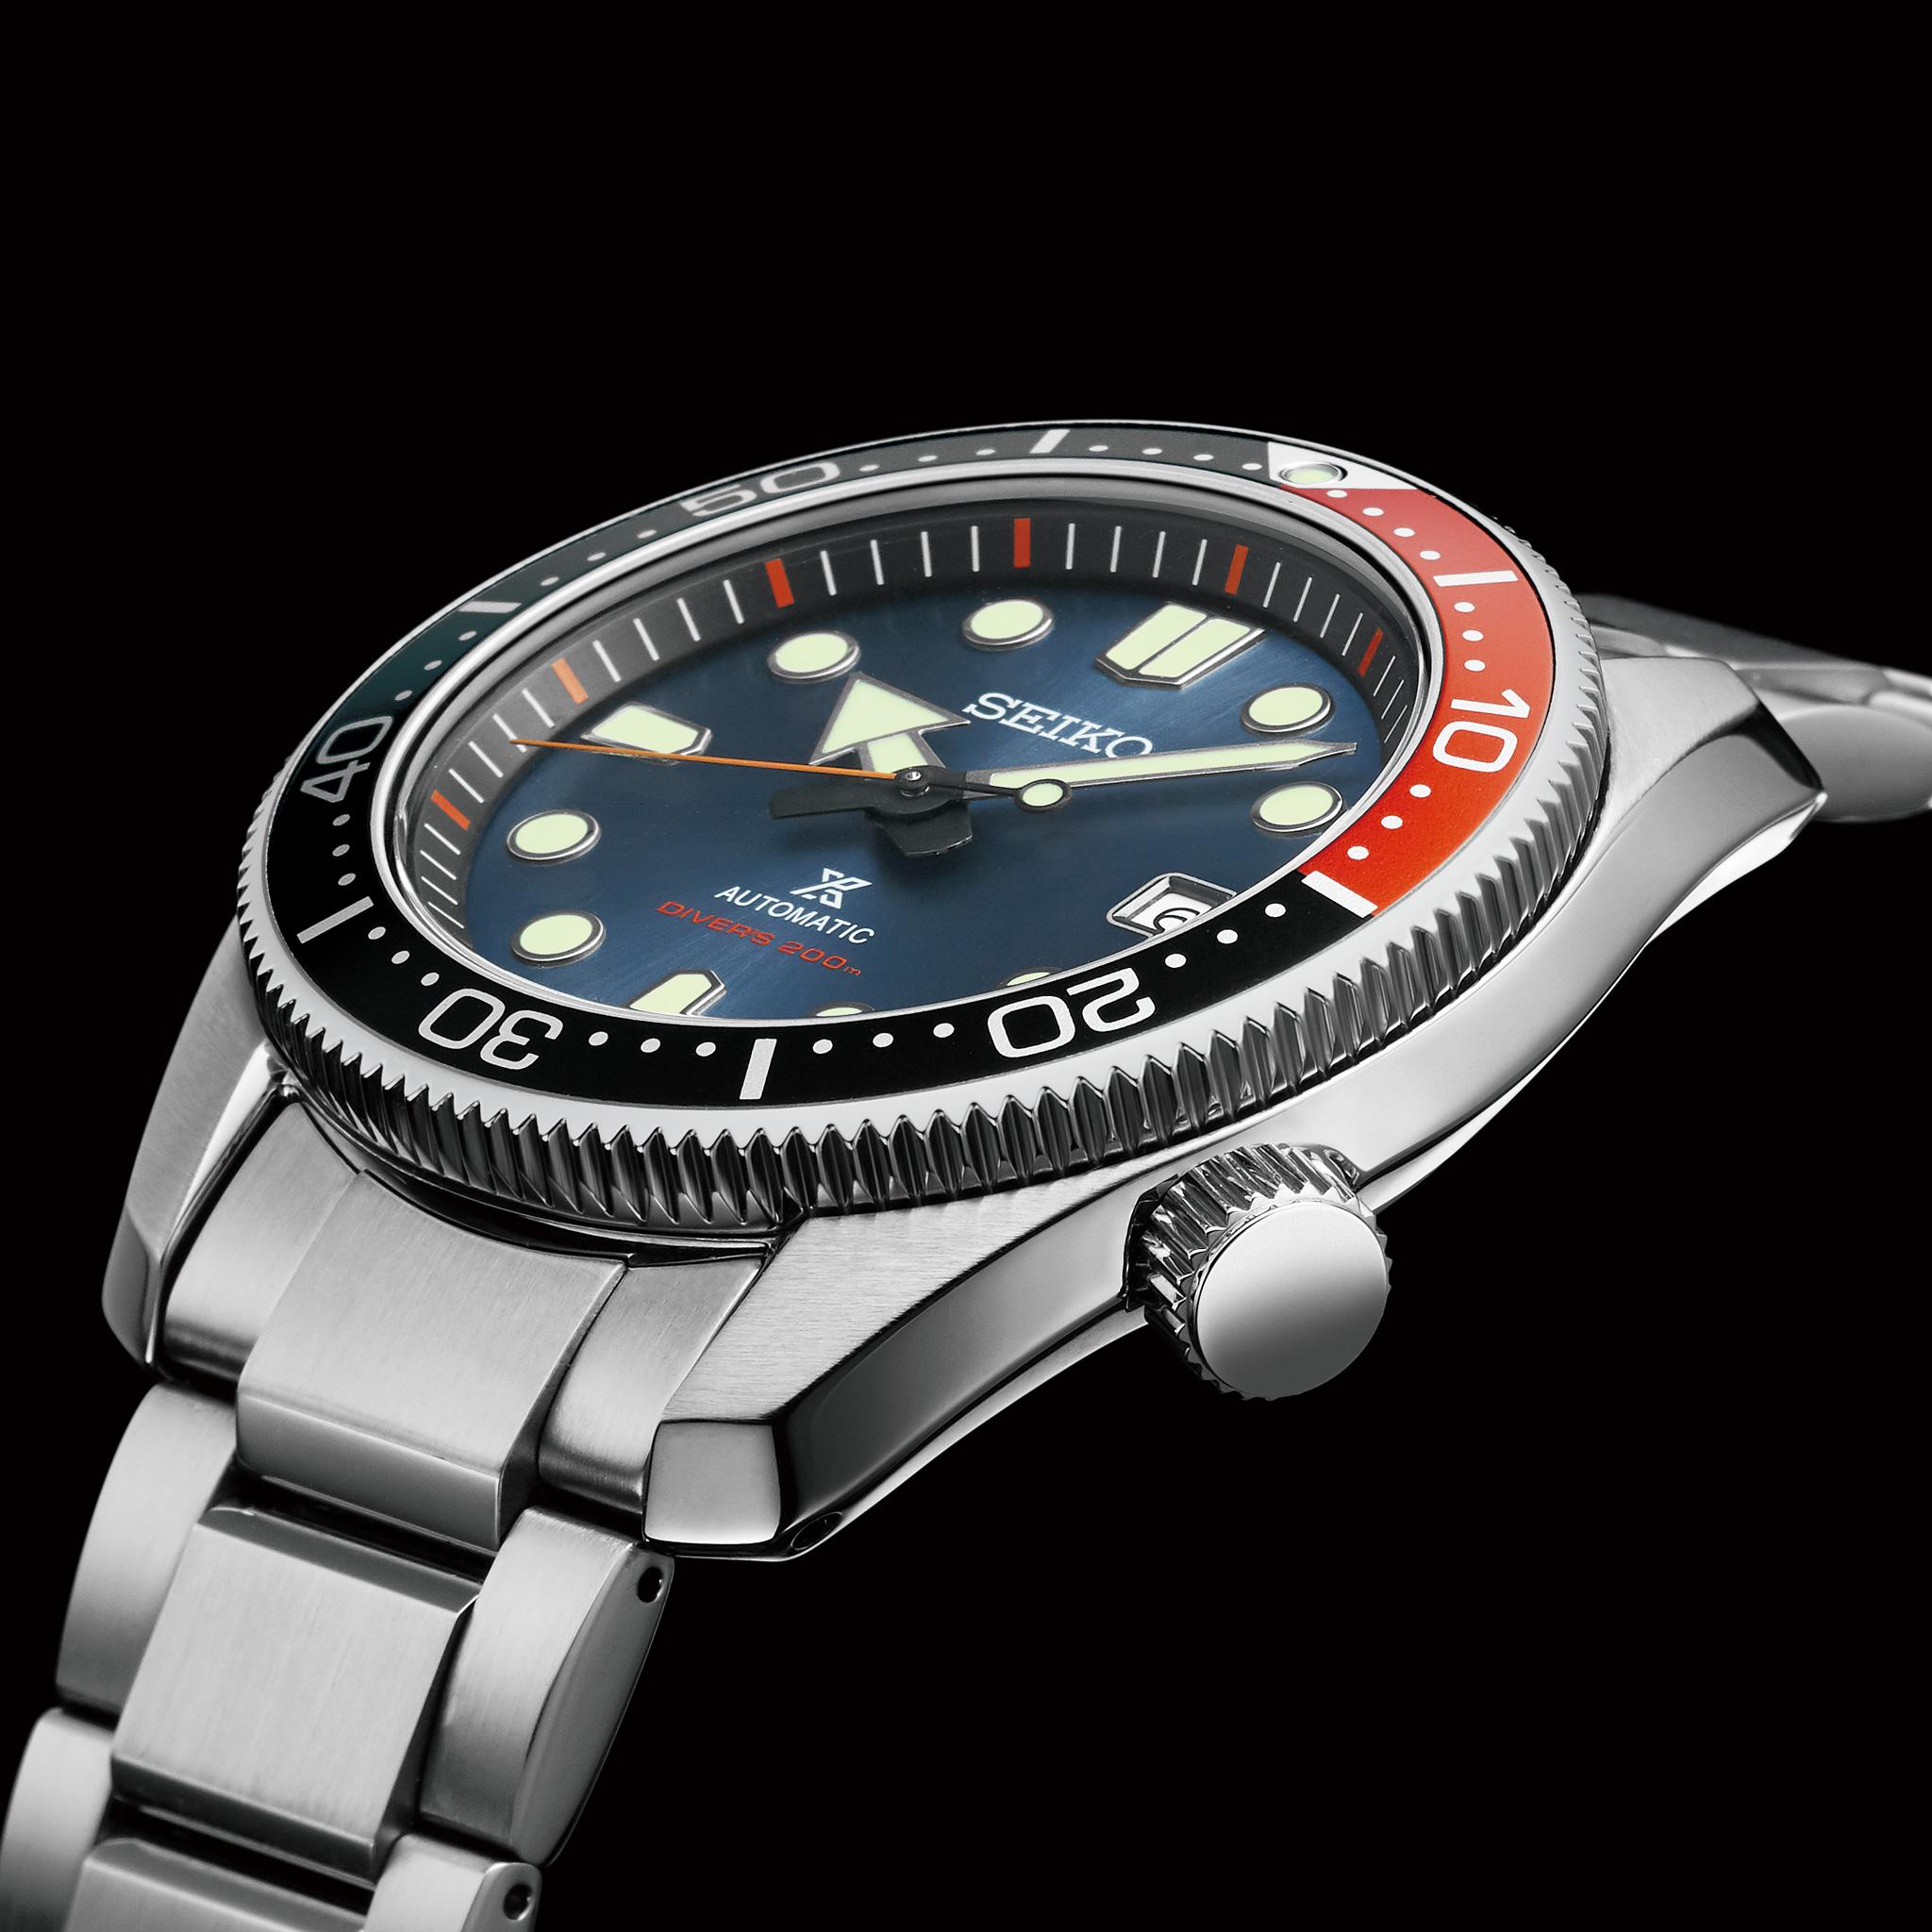 Seiko Prospex Diver SPB097J1 Twilight Blue - Orologio Automatico Uomo - Casavola Noci - m2